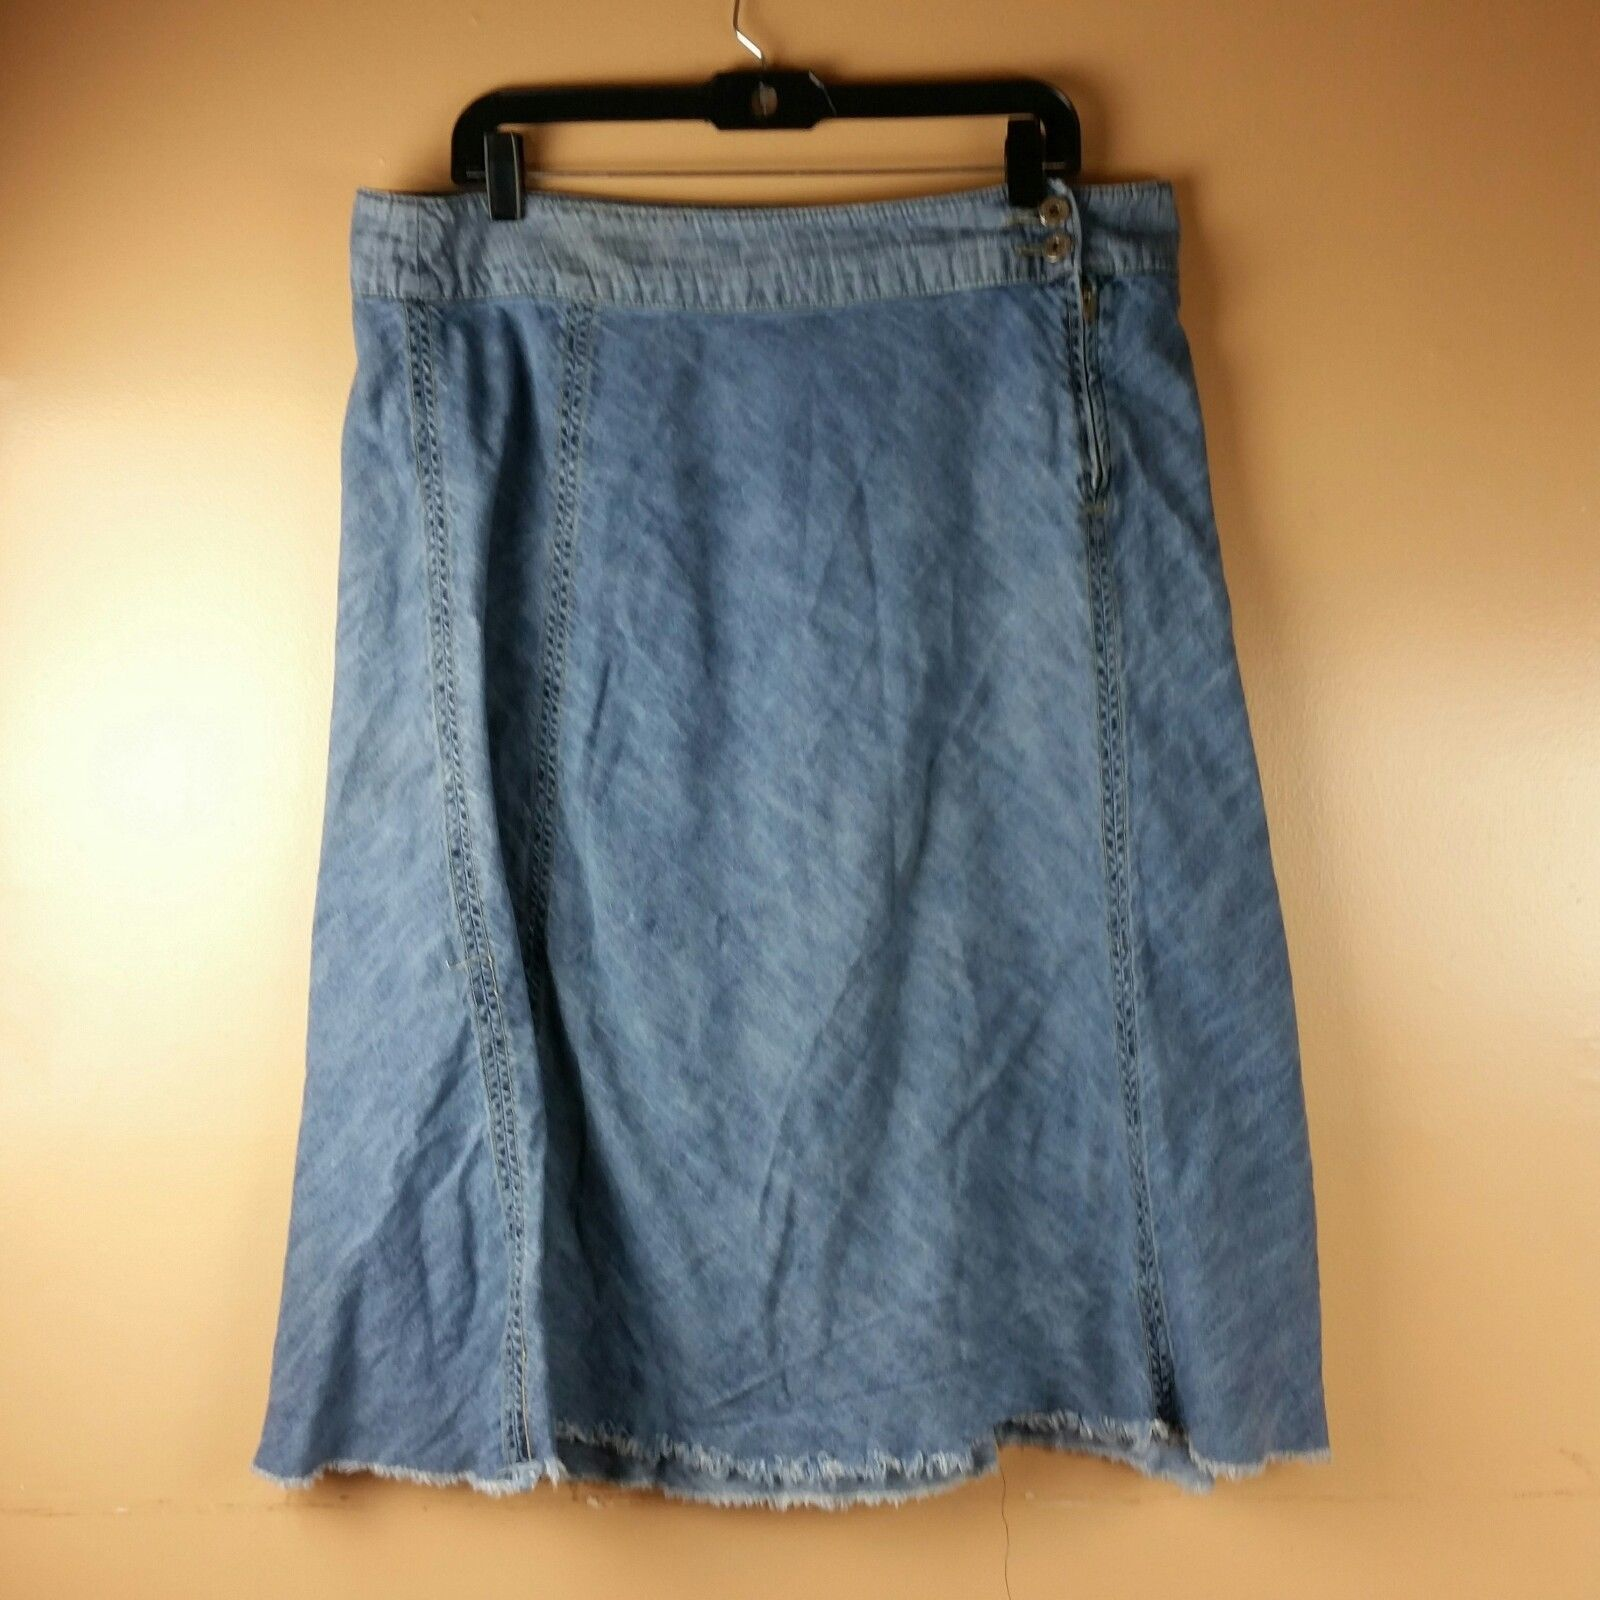 LEE Jean Skirt Womens One True Fit Modest Denim Fringe Hem Size 15/16M image 6